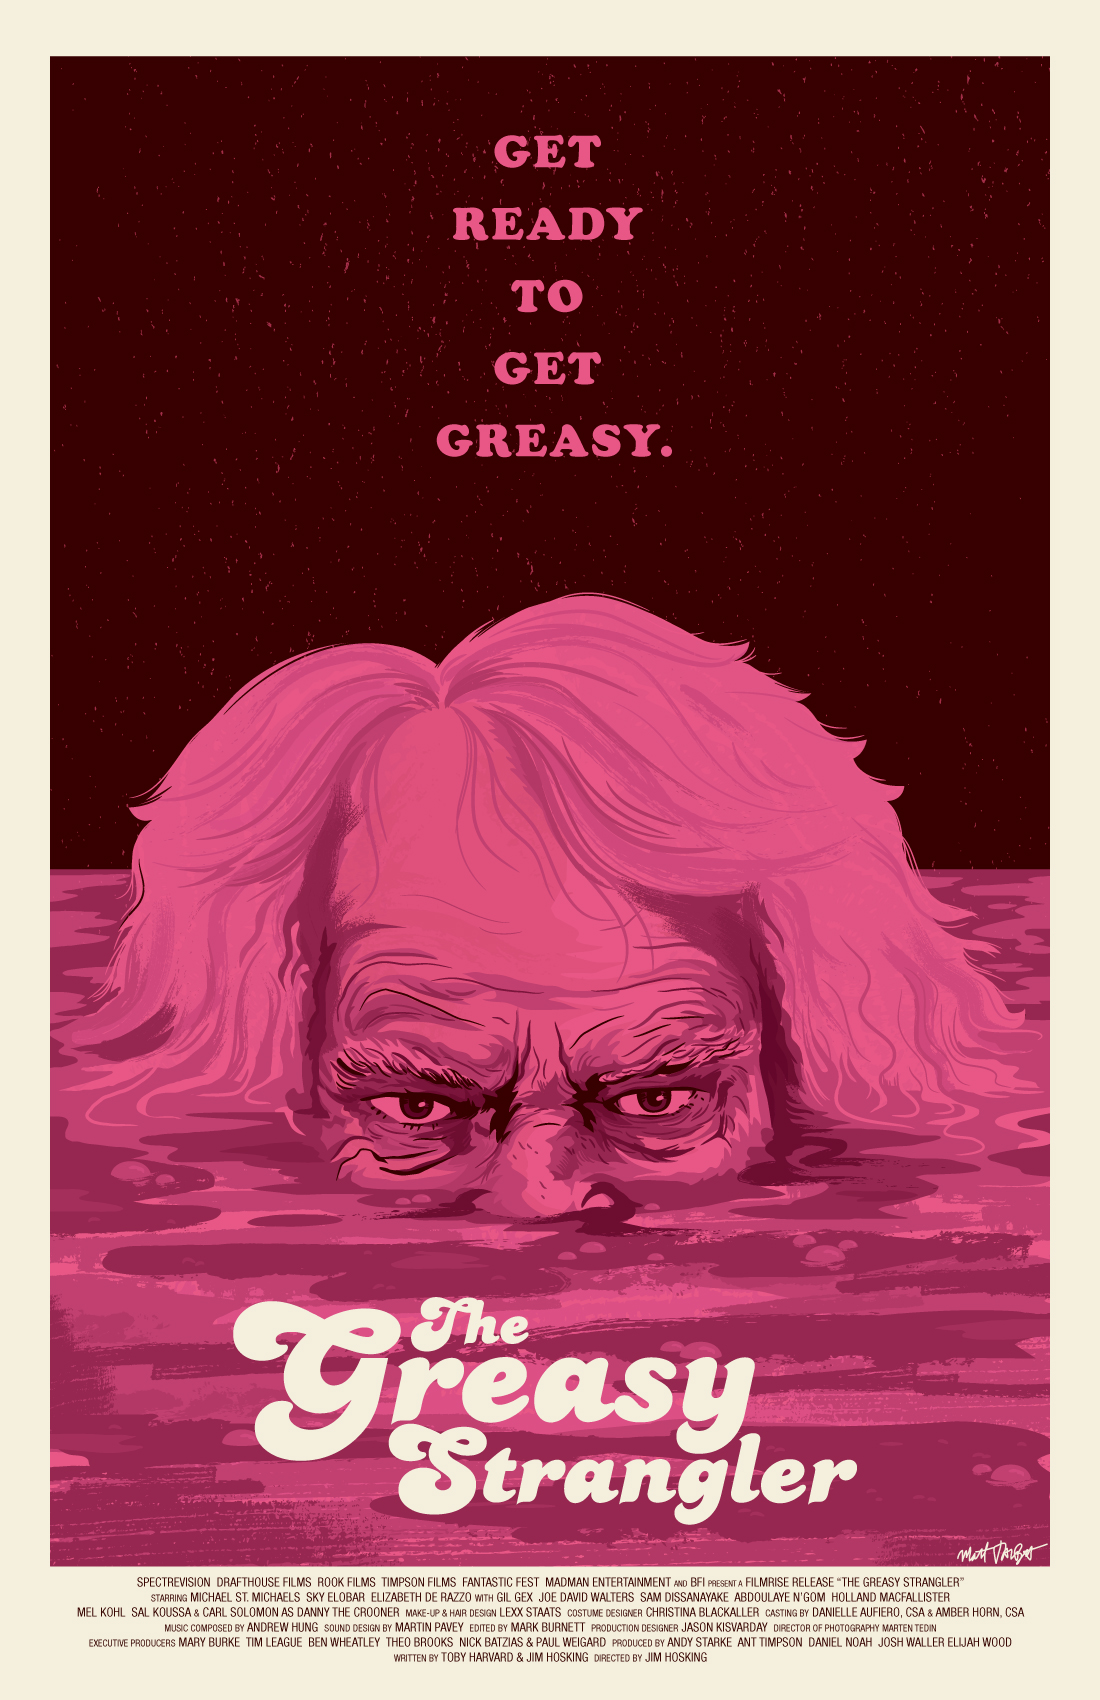 The Greasy Strangler Poster by Matt Talbot